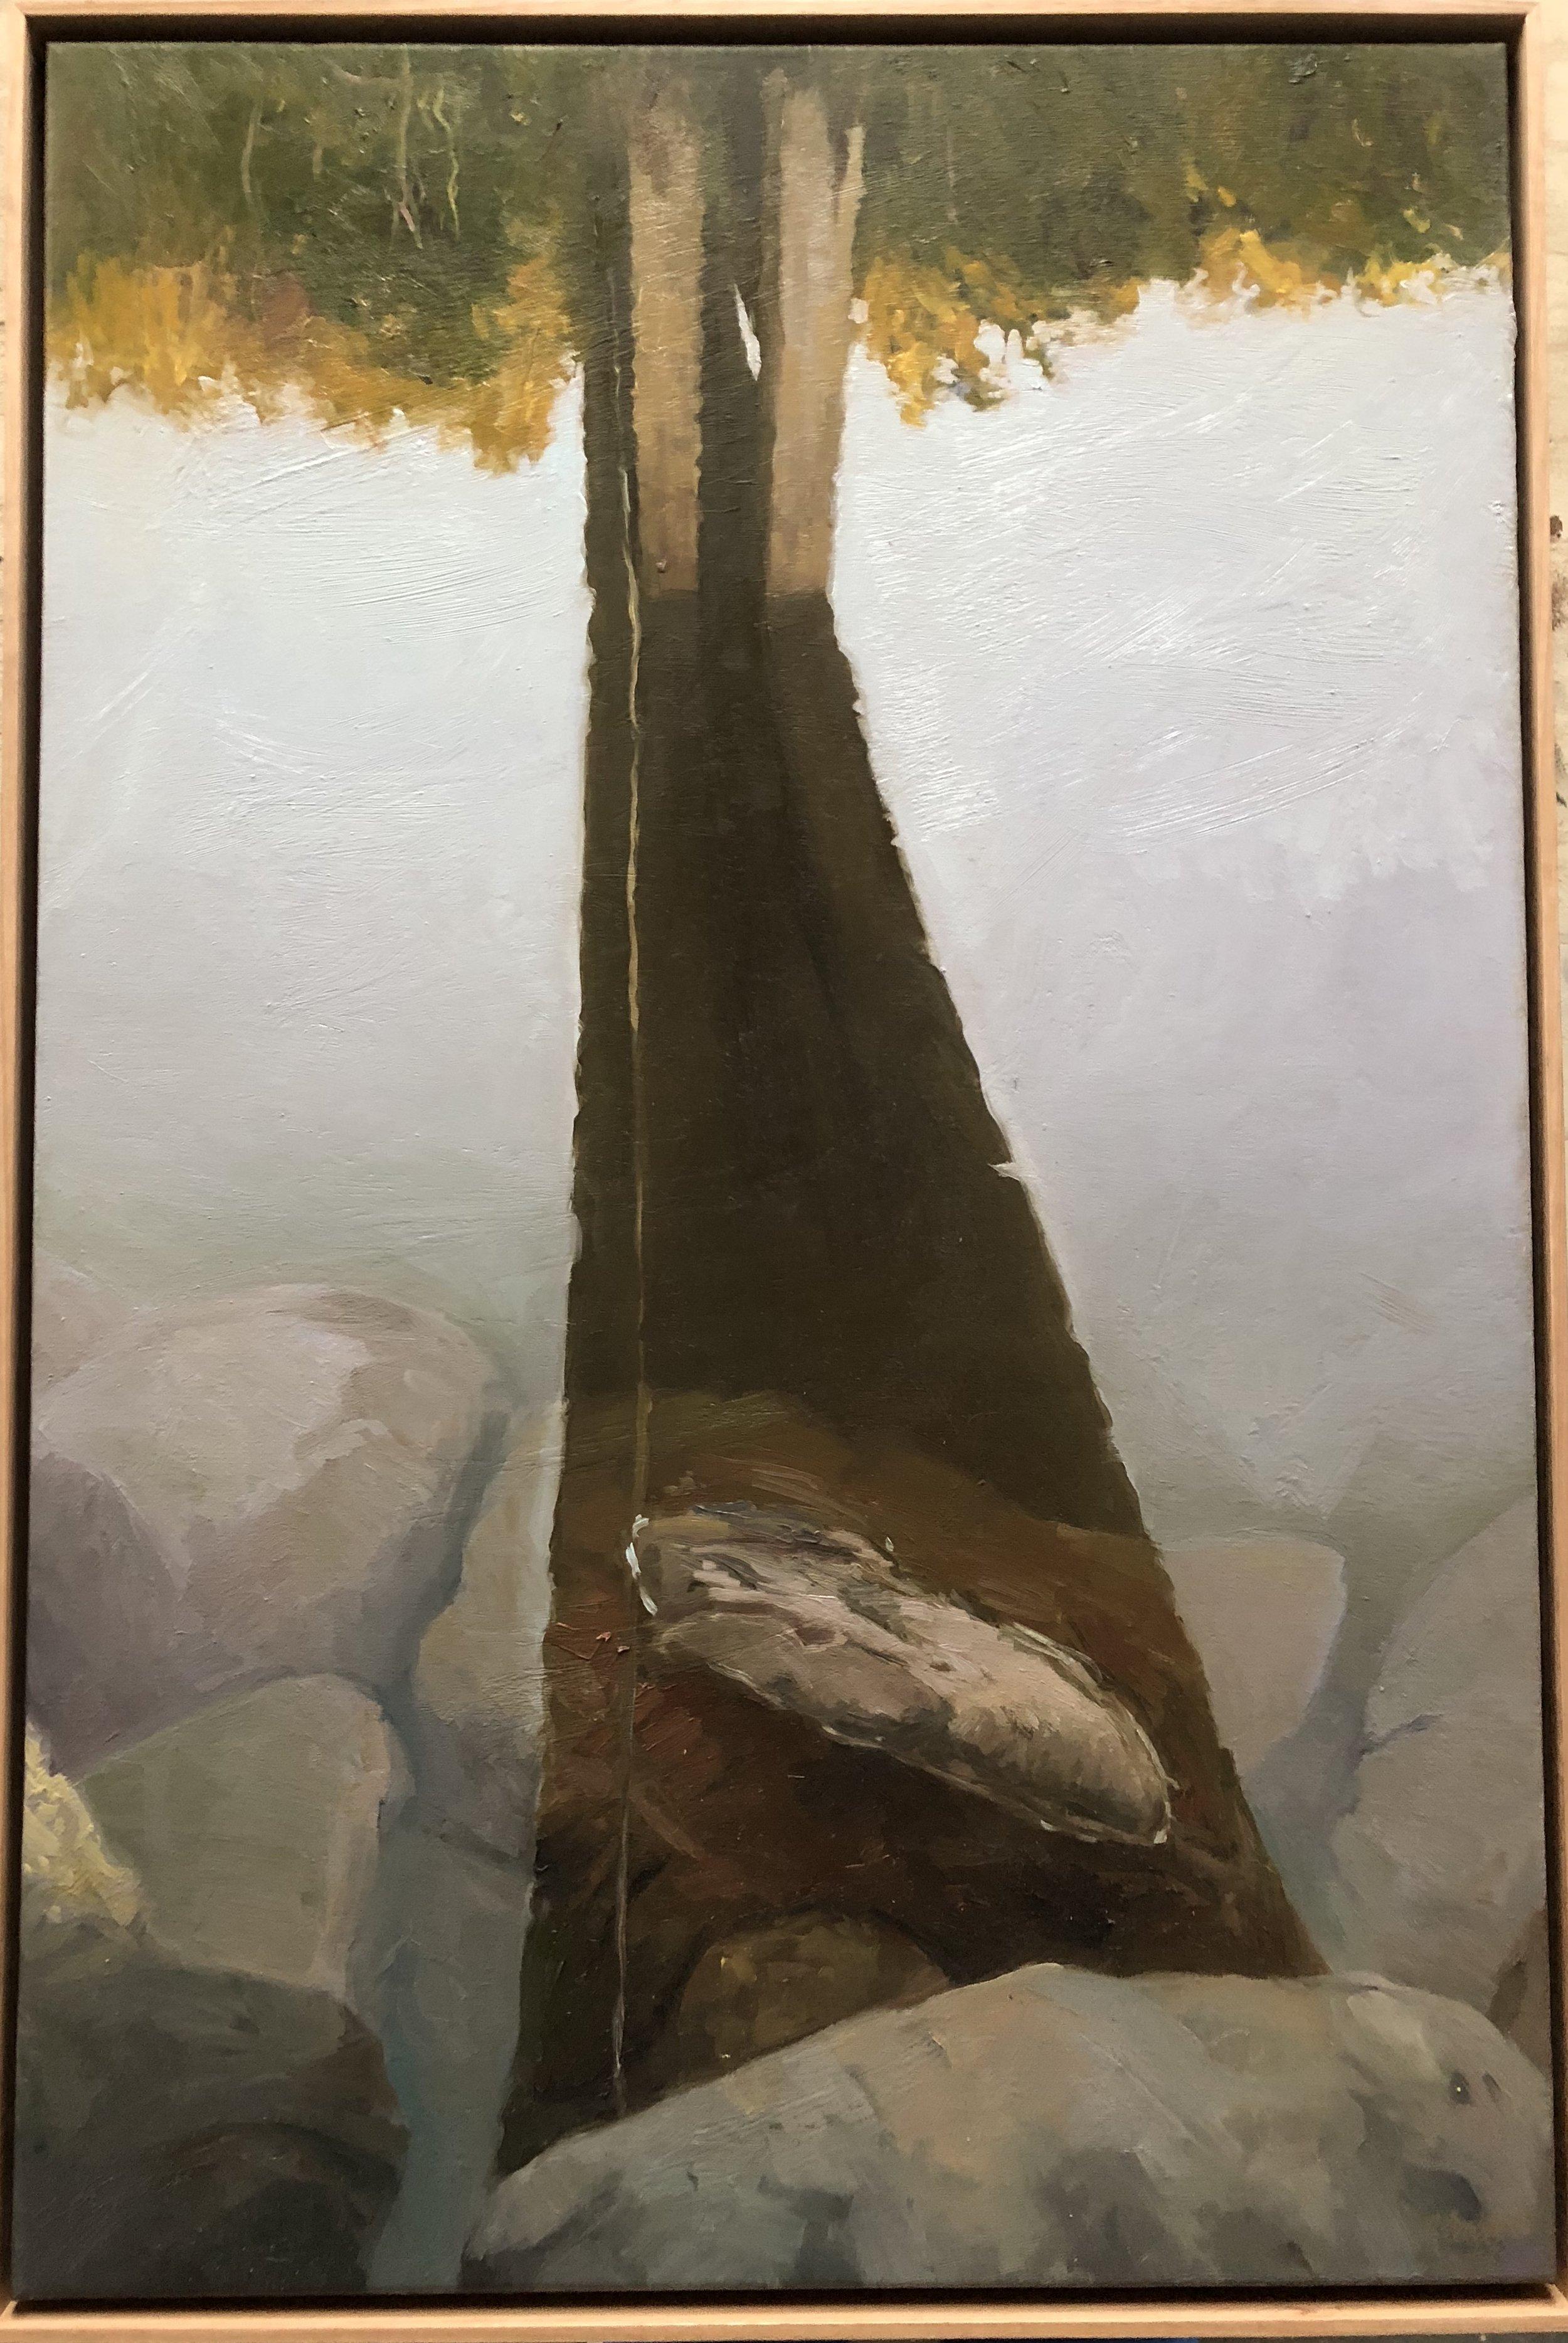 Dino Consalvo  Bridge (Mooney Mooney Creek) 2017  oil on canvas  92 x 61cm  $2800.00 (2017 Paddington Prize Finalist artwork)